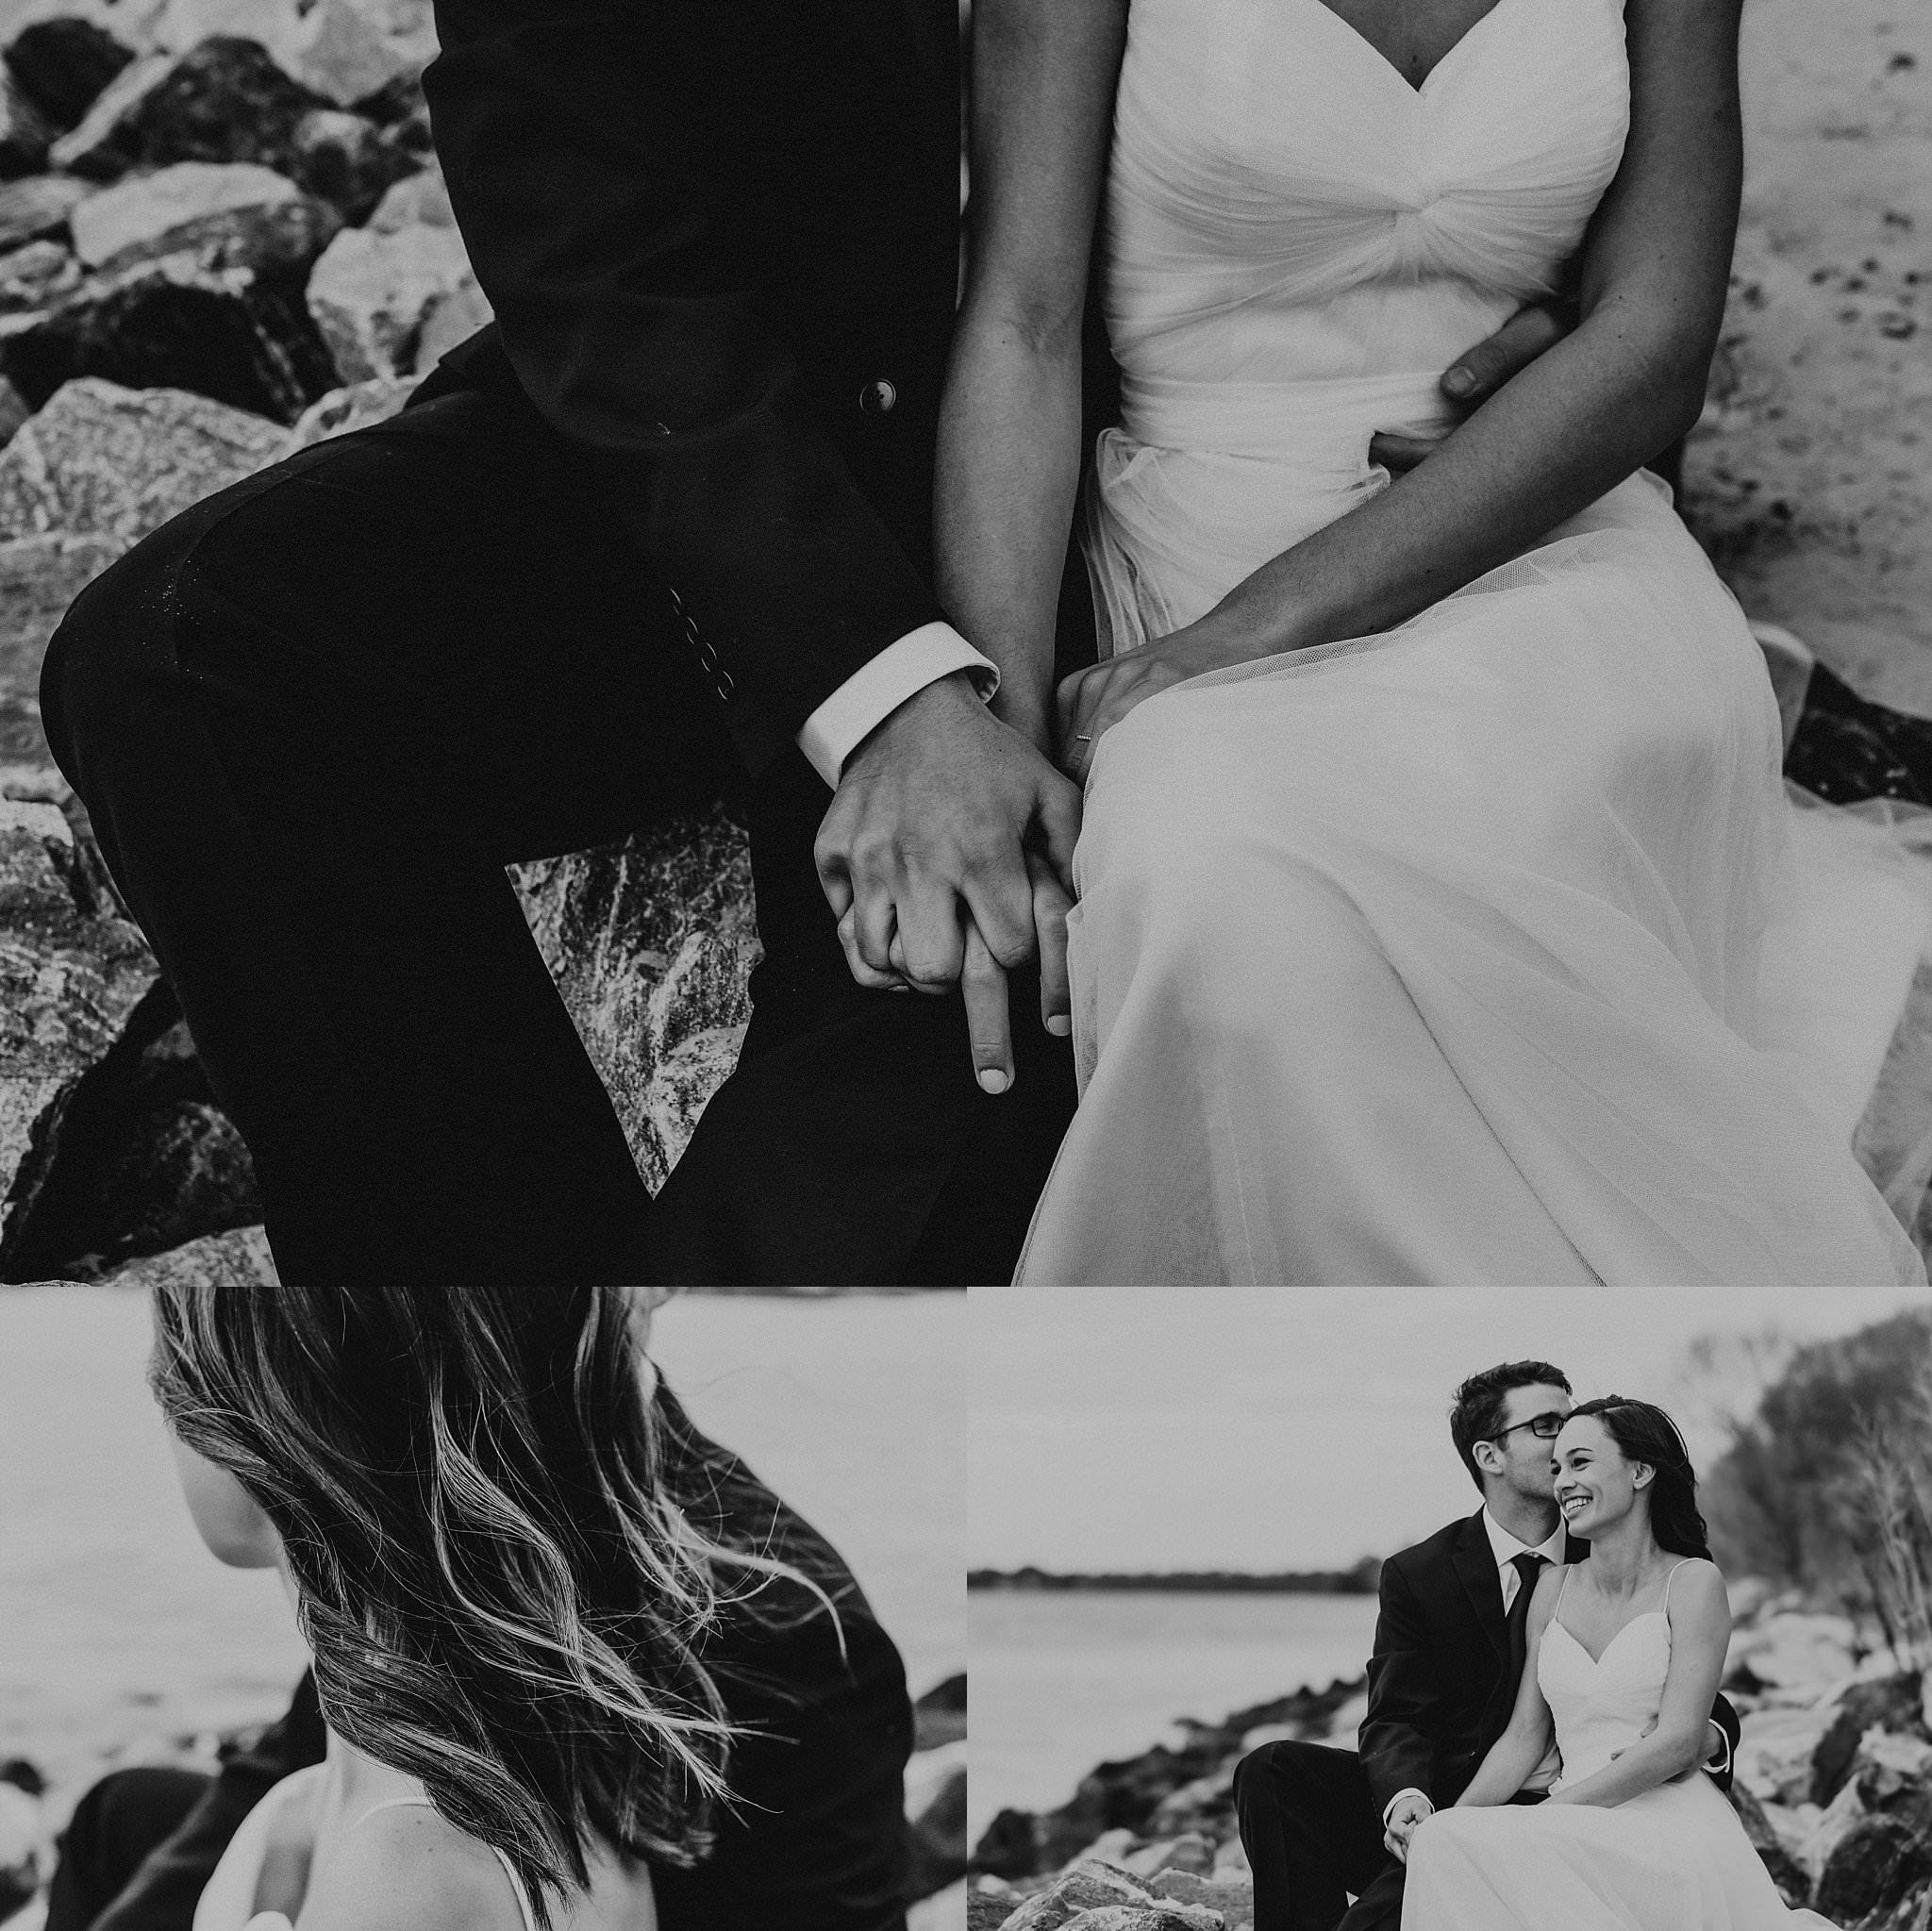 award-winning-wedding-photos-by-melissa-bliss-photography-norfolk-virginia-beach-charlottesville-wedding-photographer.jpg